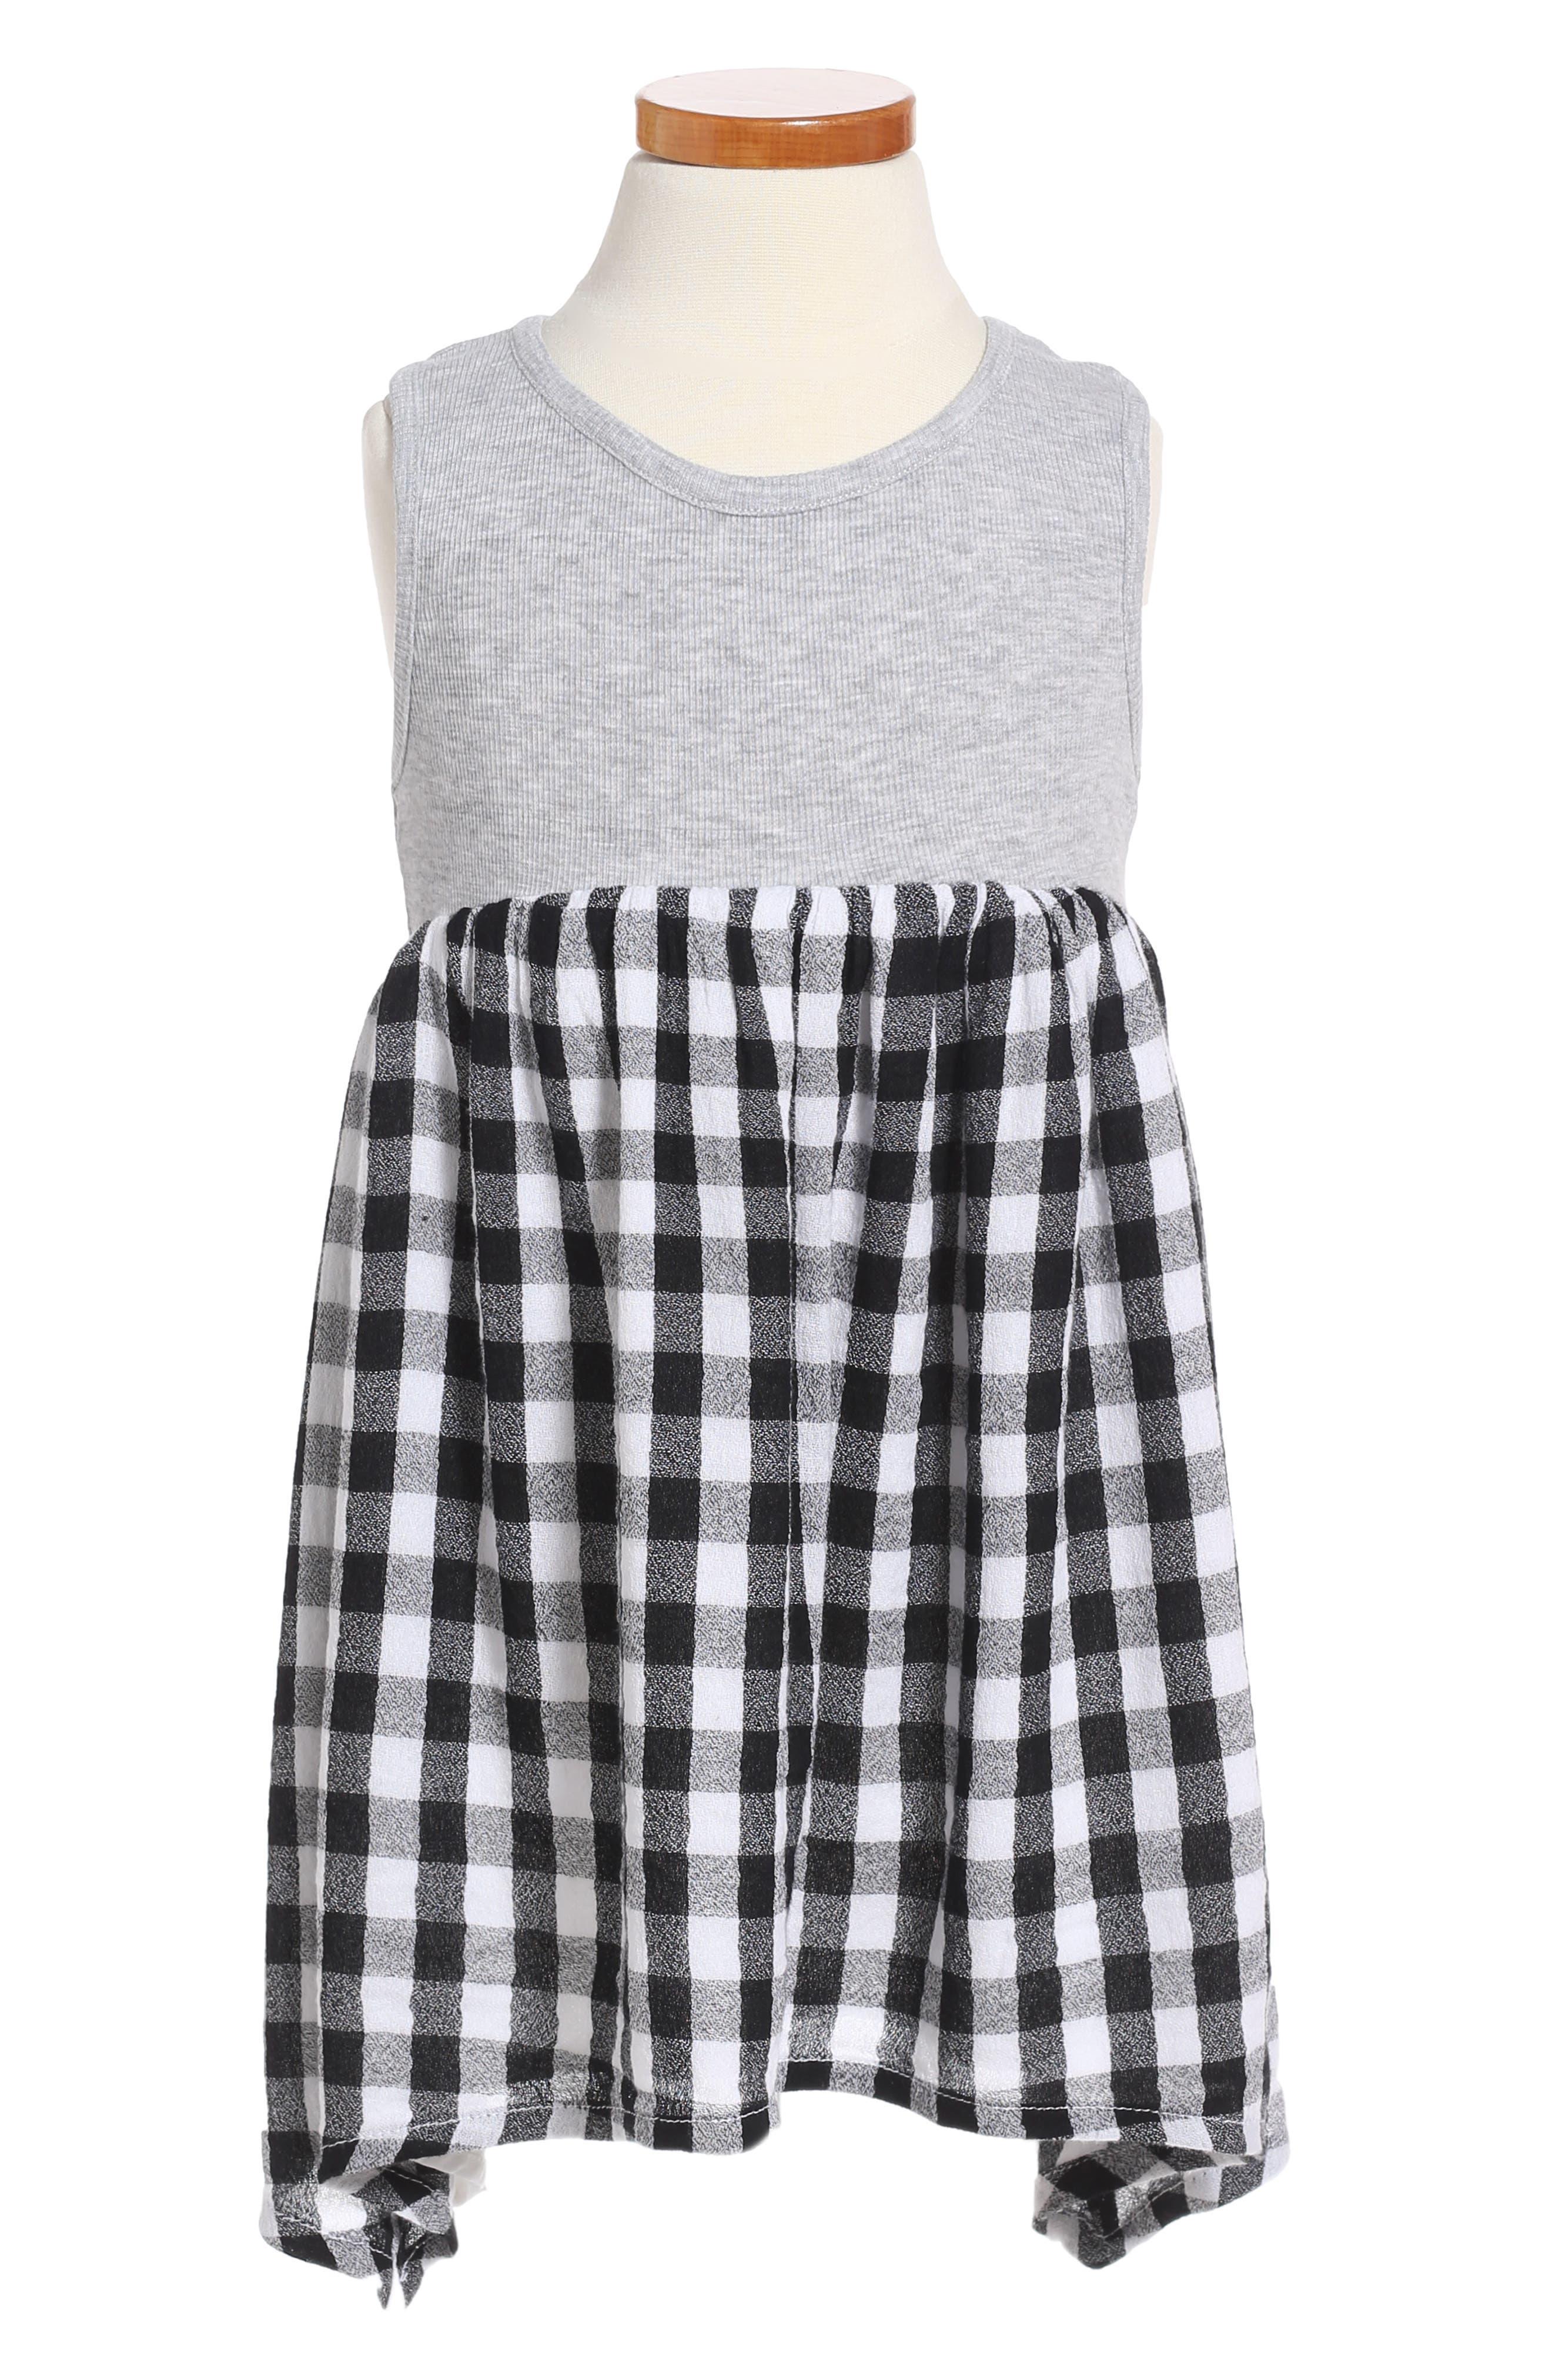 Main Image - Tucker + Tate Mixed Media Dress (Toddler Girls, Little Girls & Big Girls)